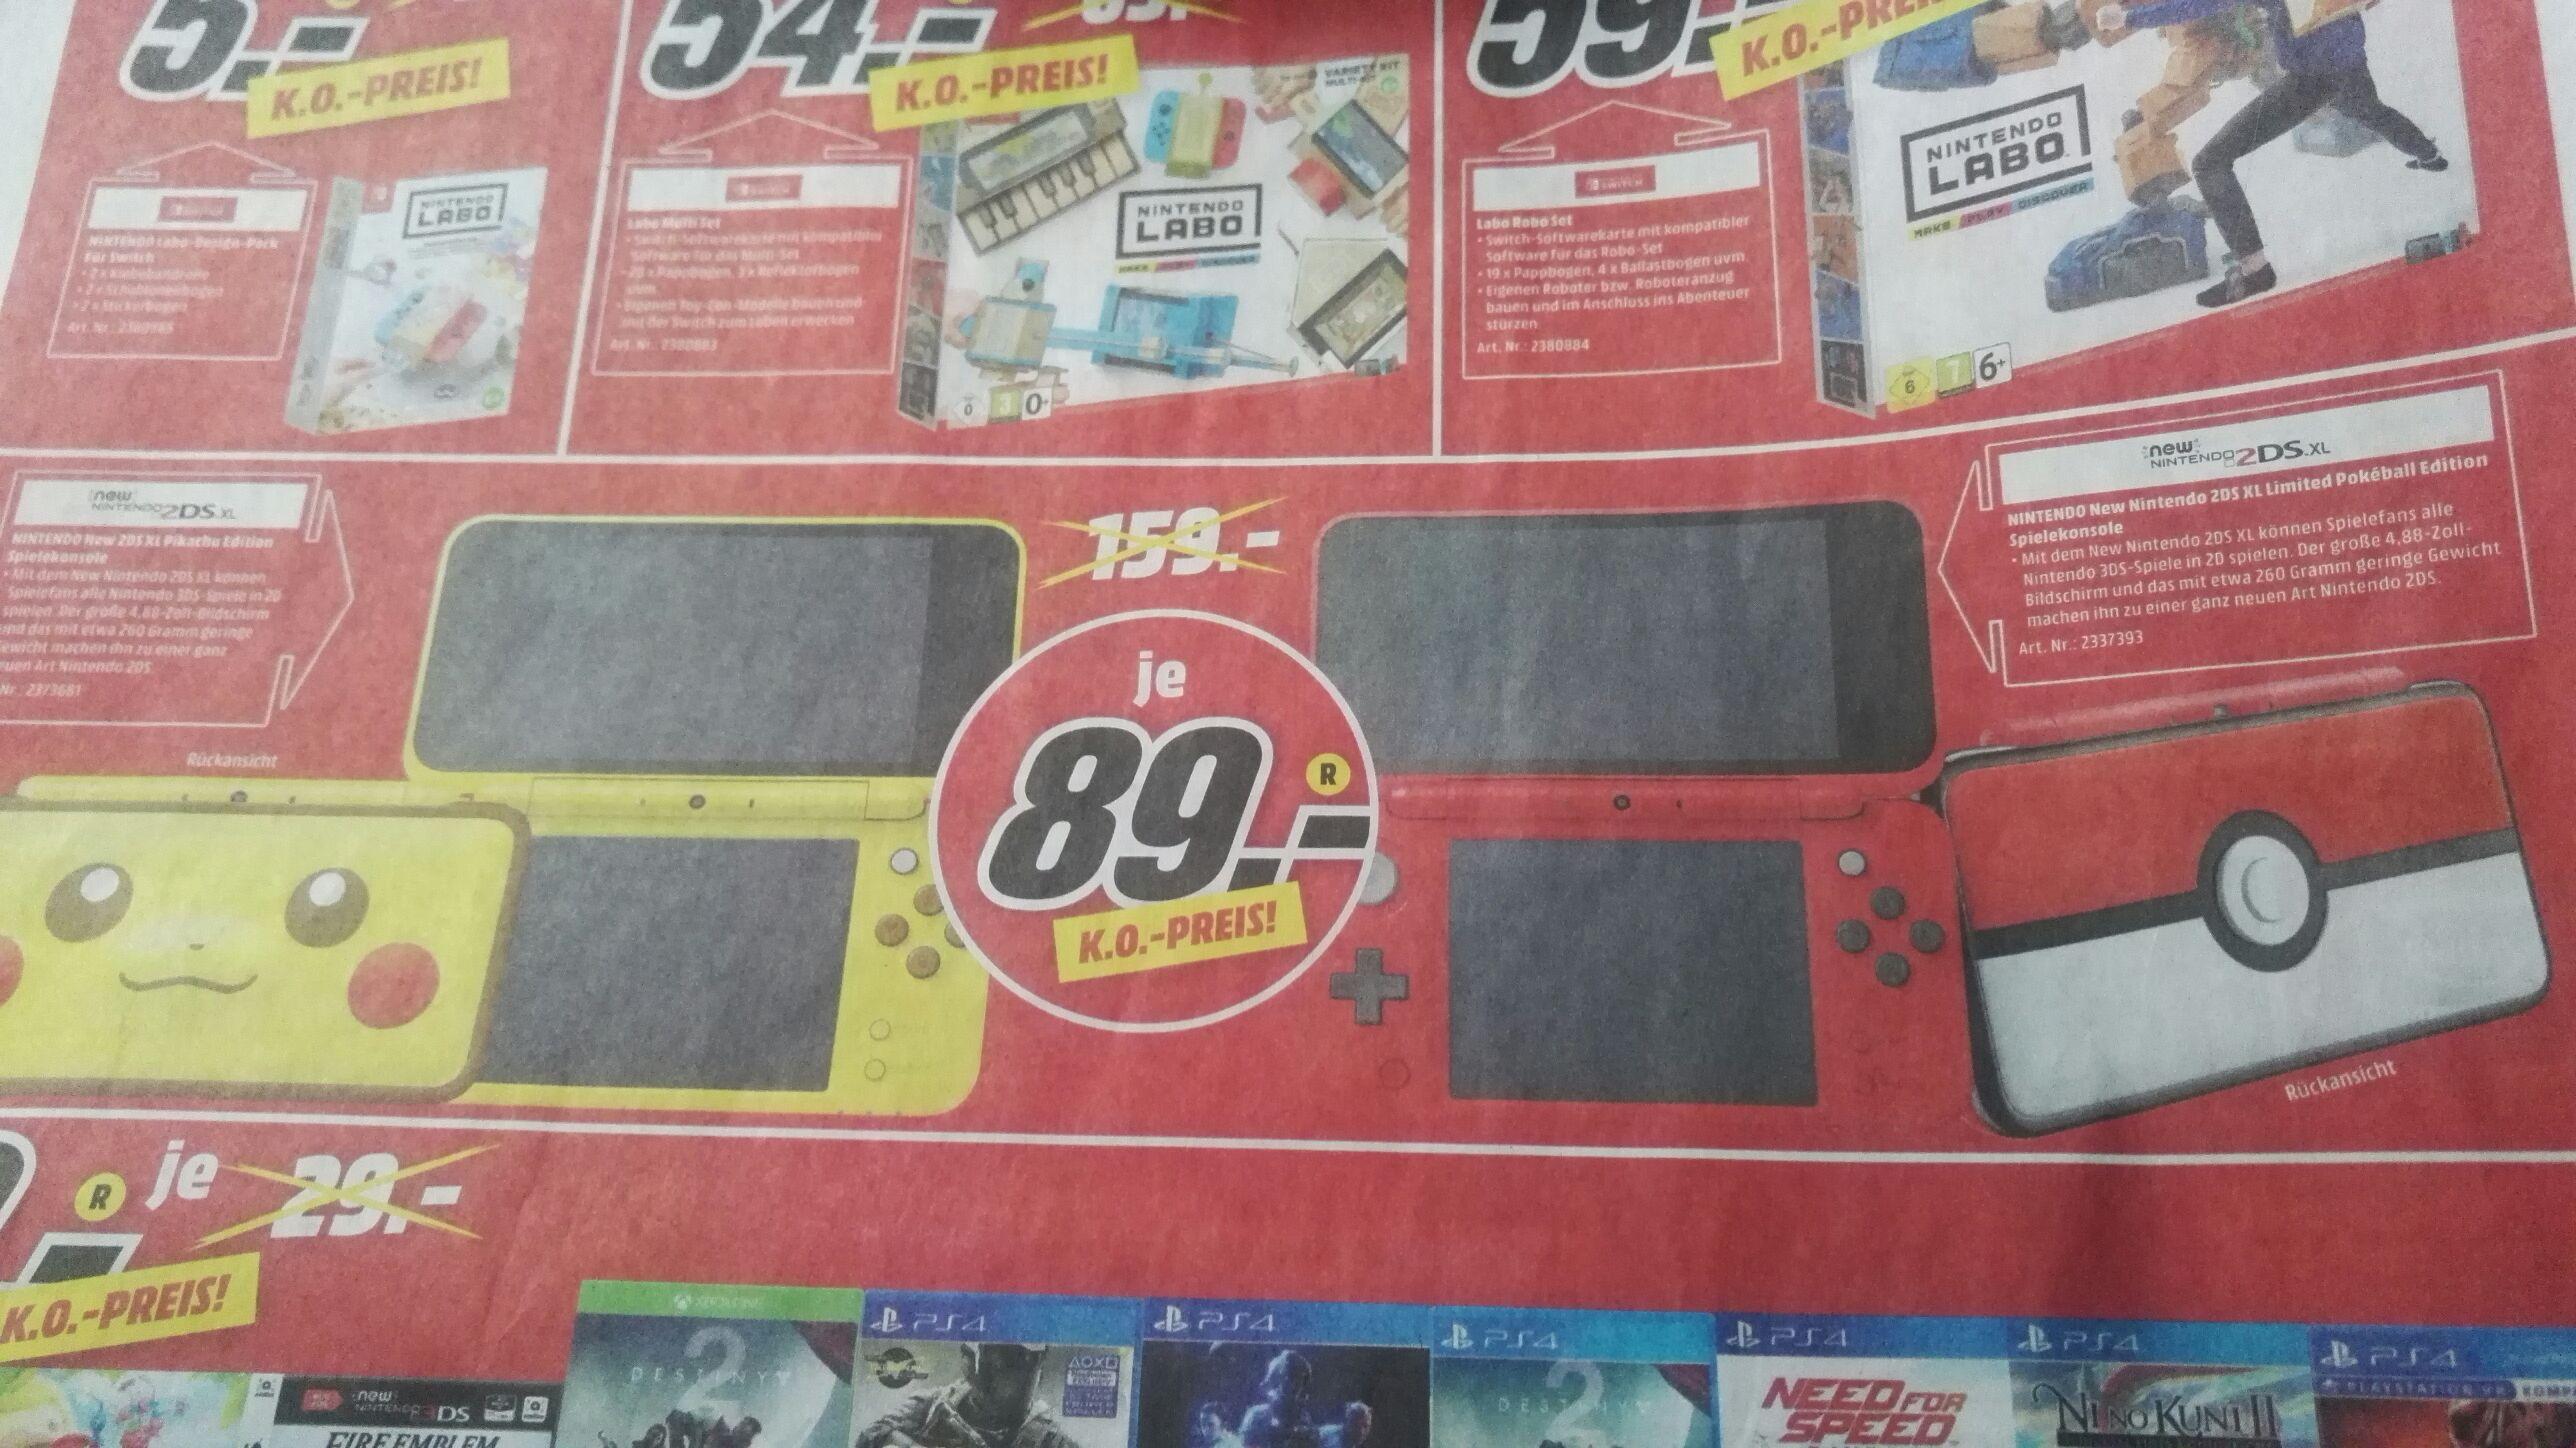 (Lokal Media Markt SLS) New 2DS XL Pokeball/Pikachu Edition für 89€